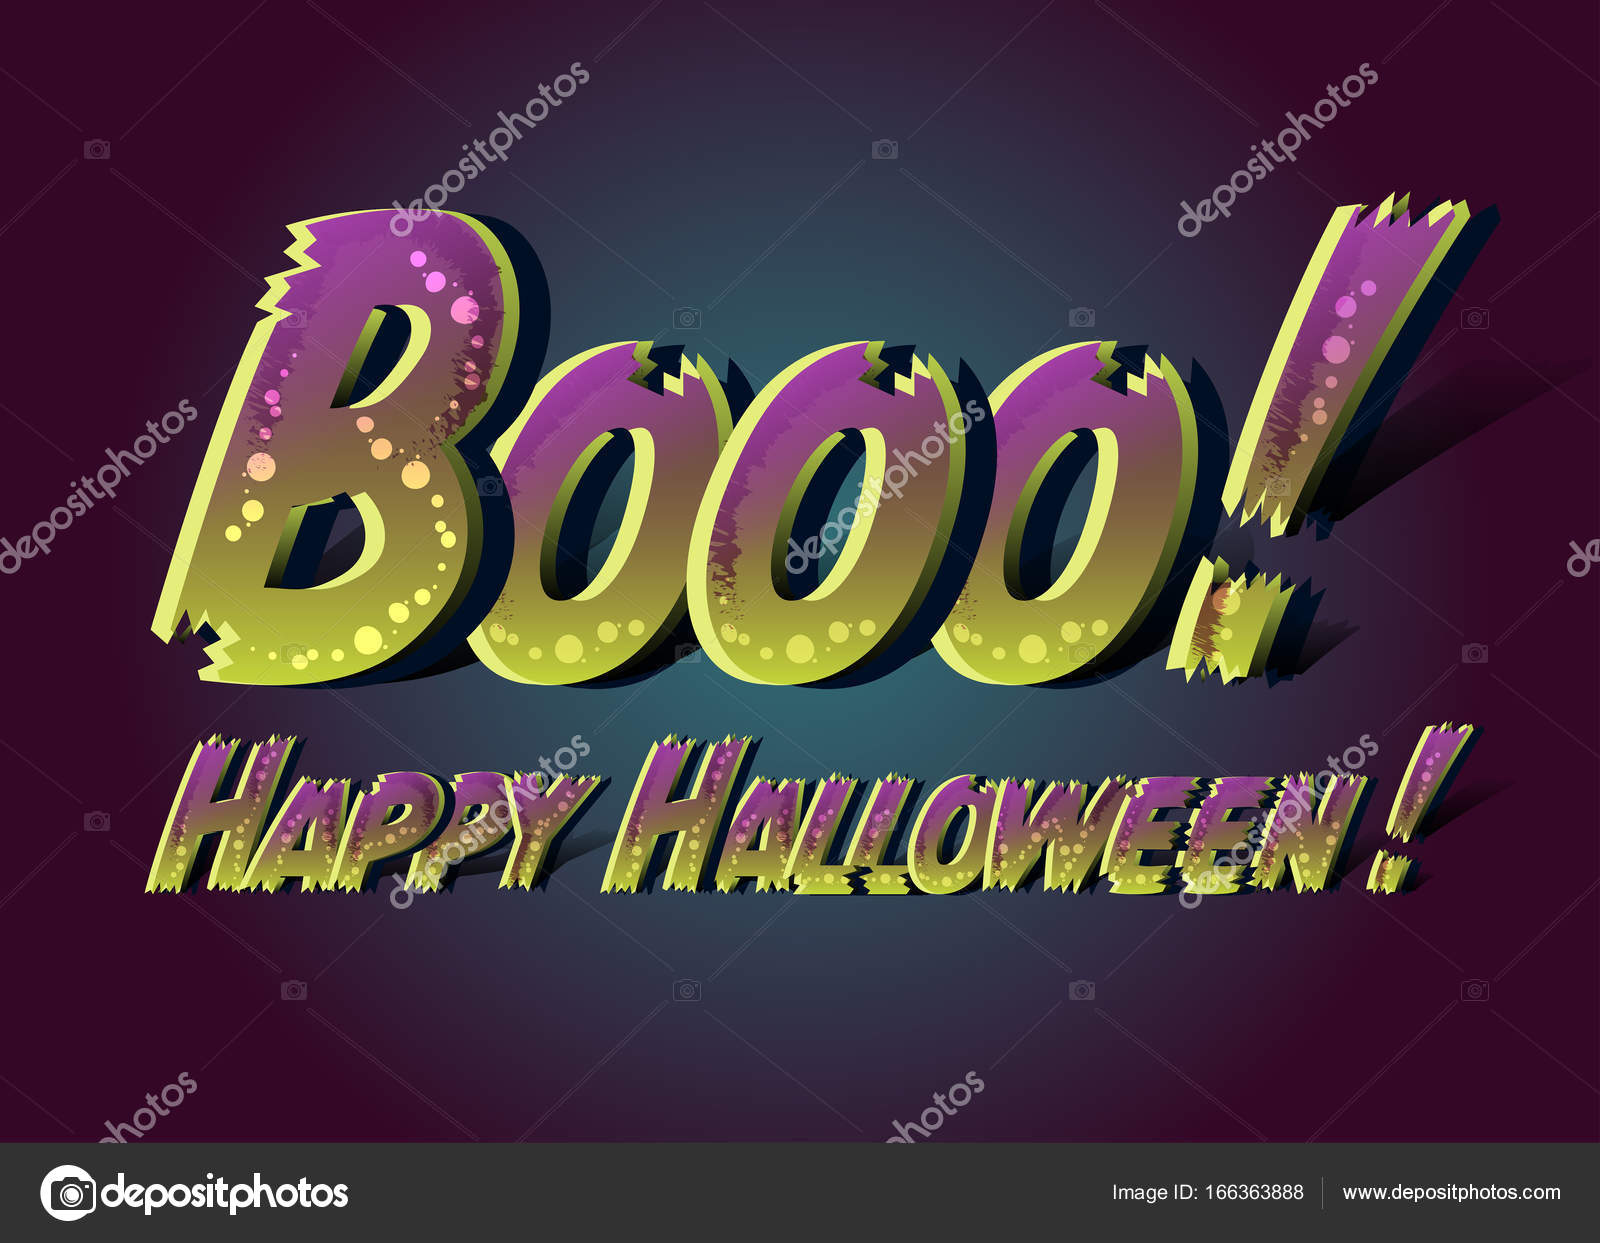 booo happy halloween happy halloween funny card message design